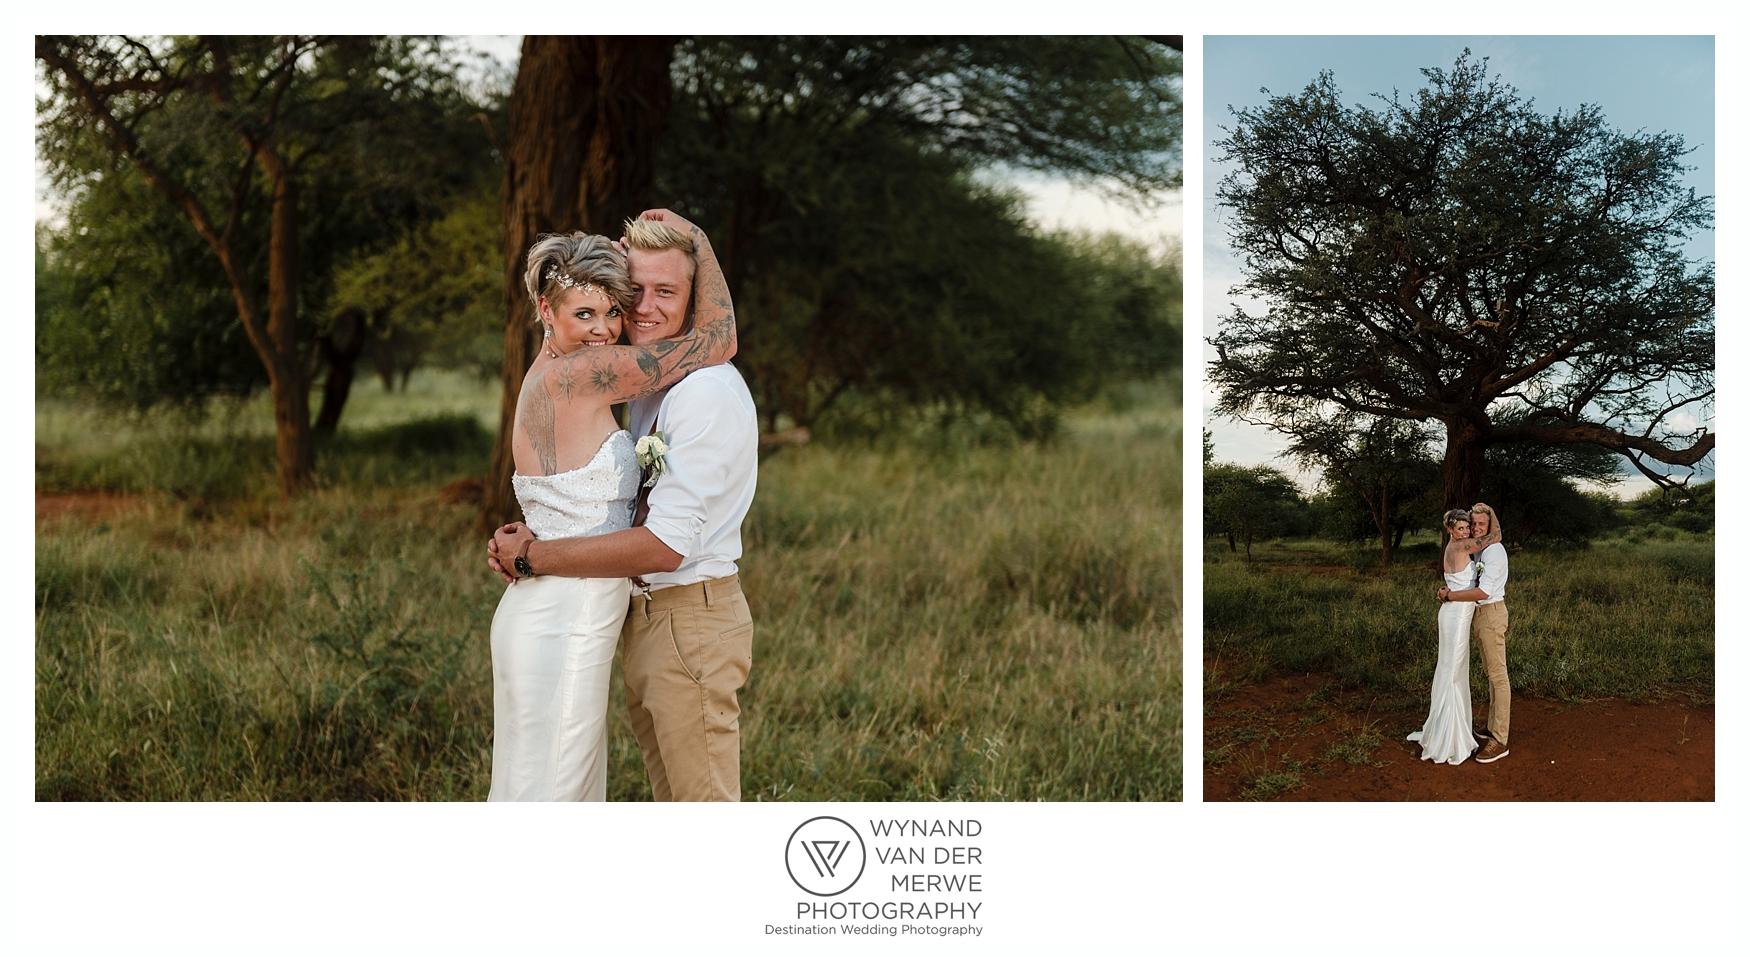 WynandvanderMerwe_weddingphotography_bushveldwedding_northam_bushveld_limpopowedding_limpopo_southafrica-279.jpg